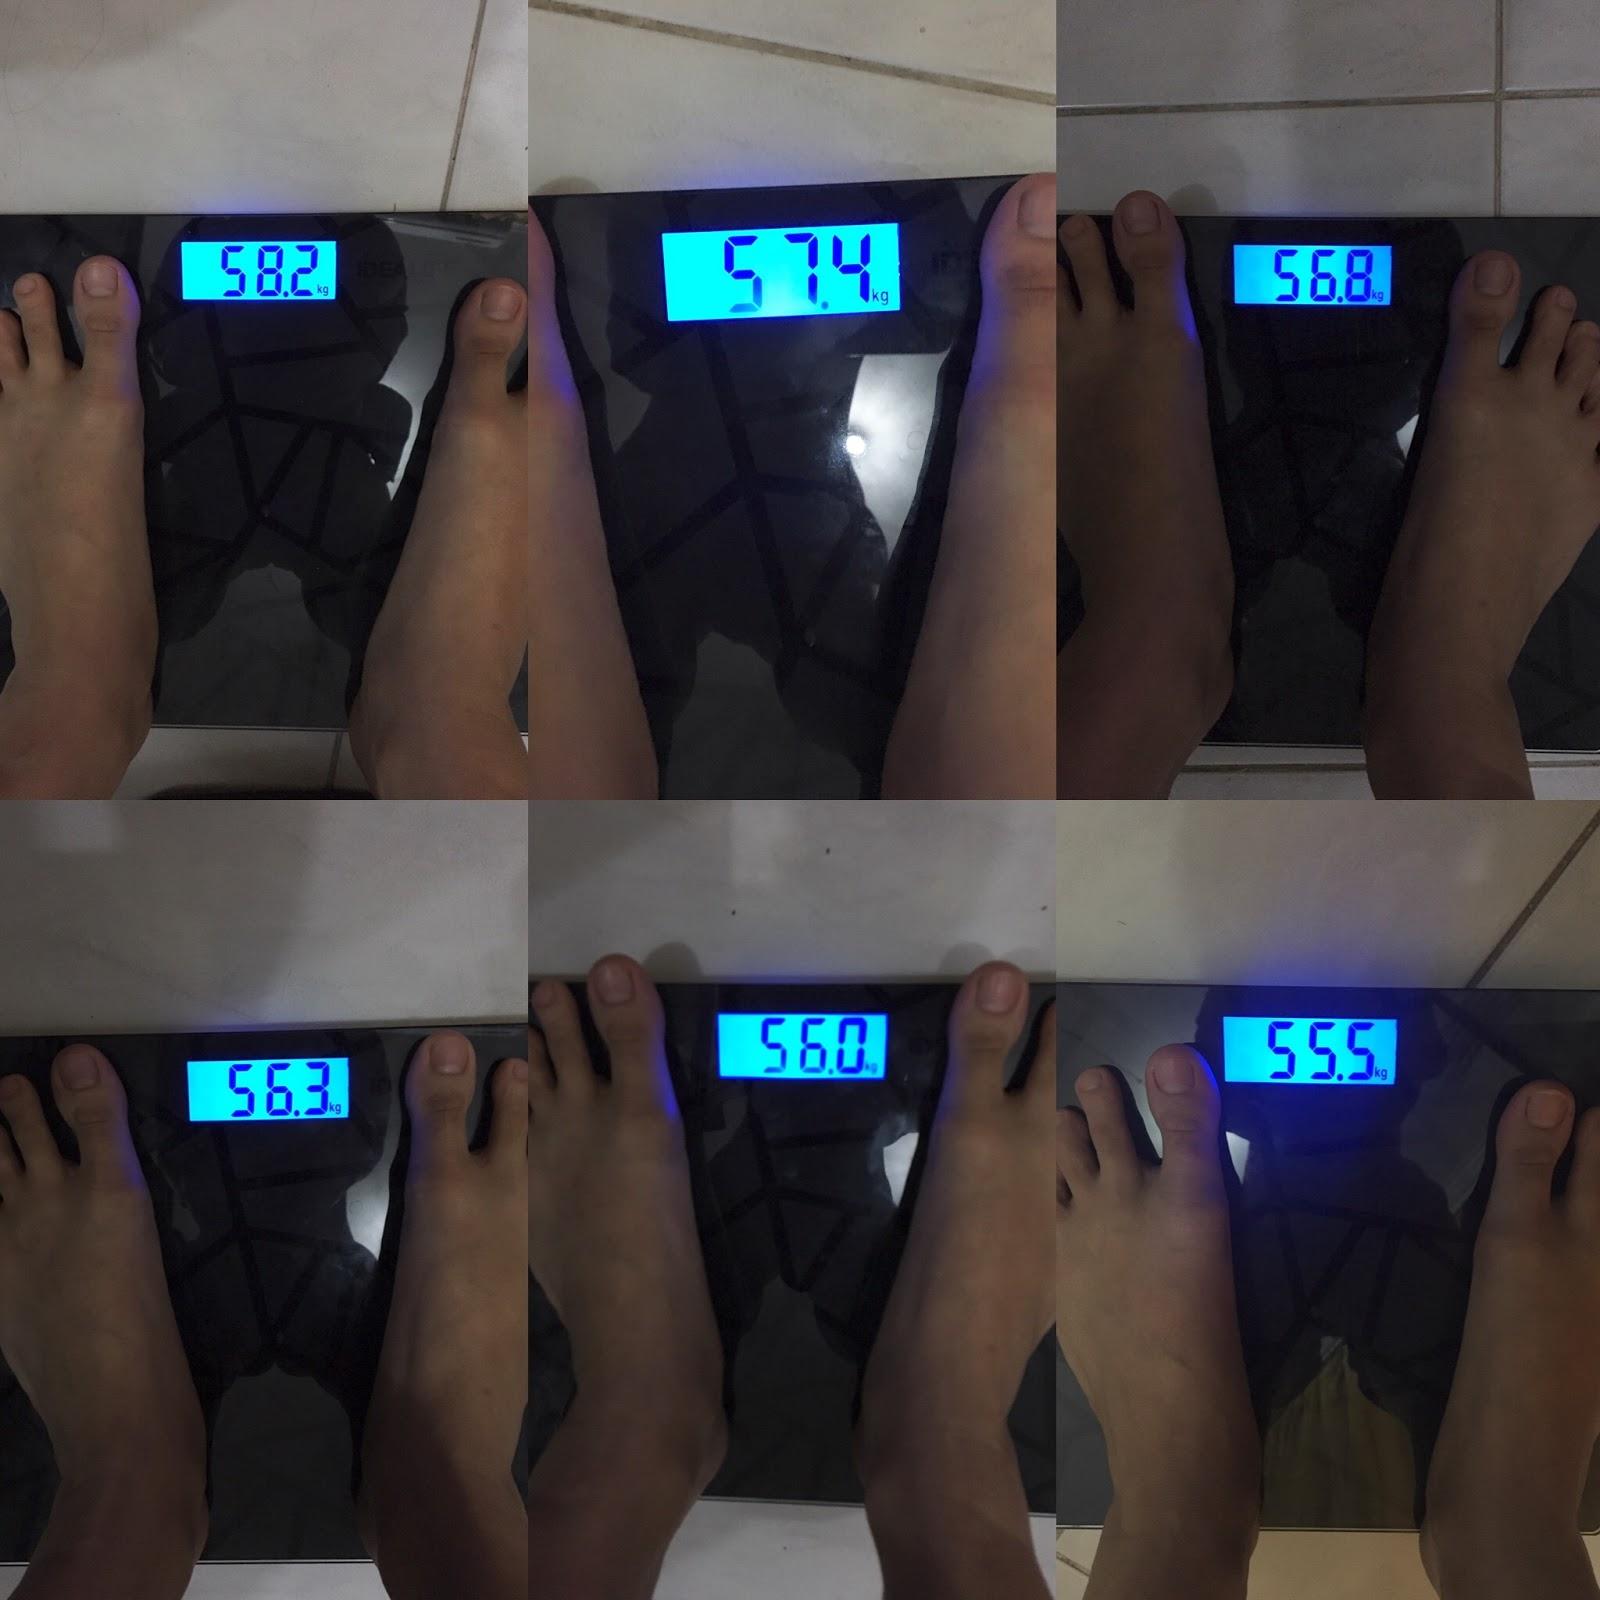 (Tsel) 0812 8462 8080 , Catering Diet Mayo Enak Jakarta Bogor Depok Tangerang Bekasi Cikarang